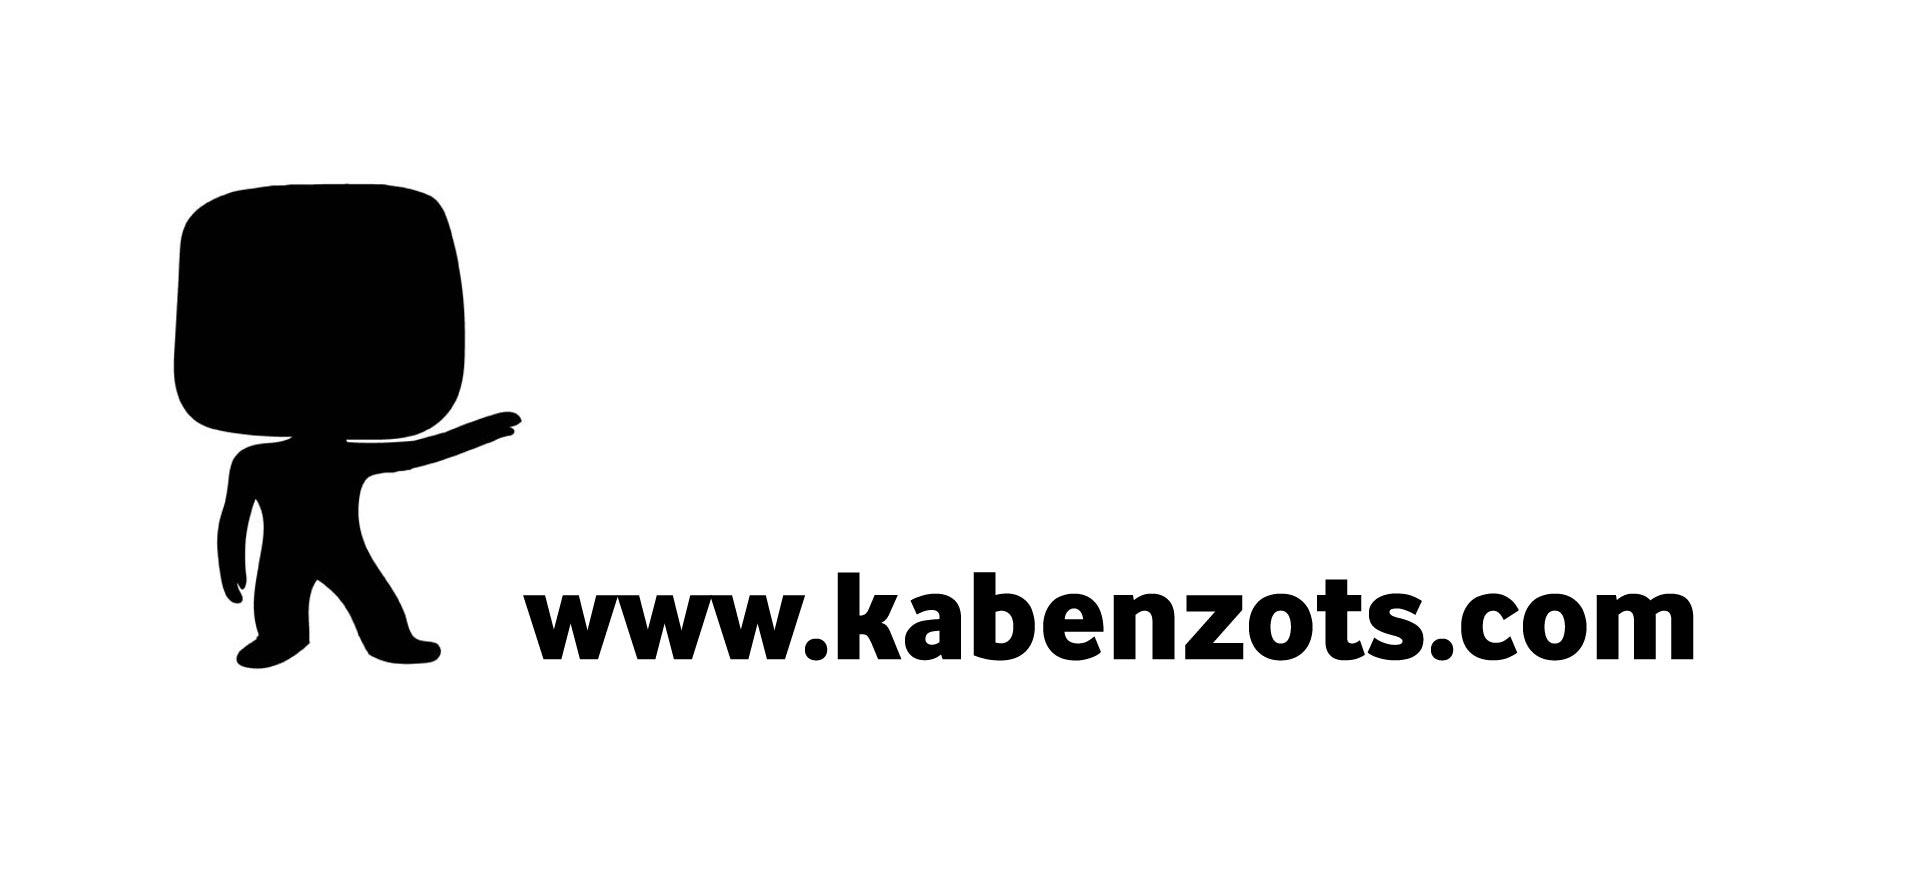 KABENZOTS